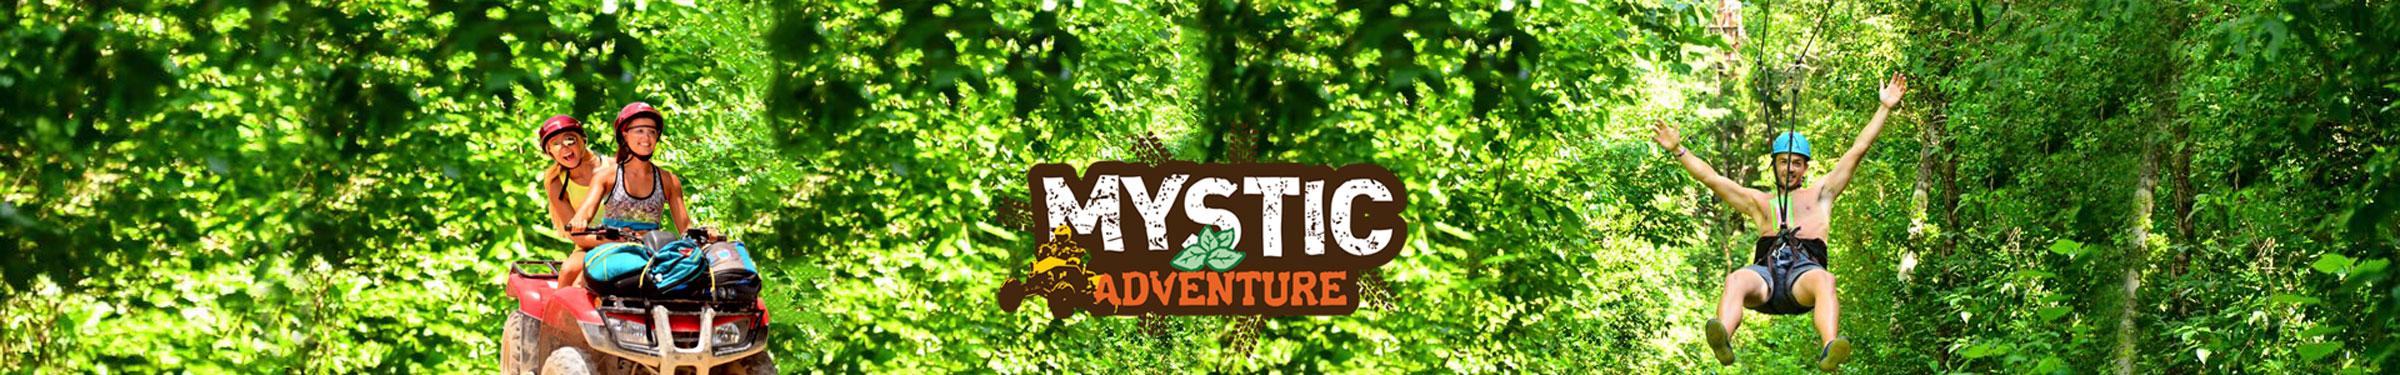 Mystic adventure banner